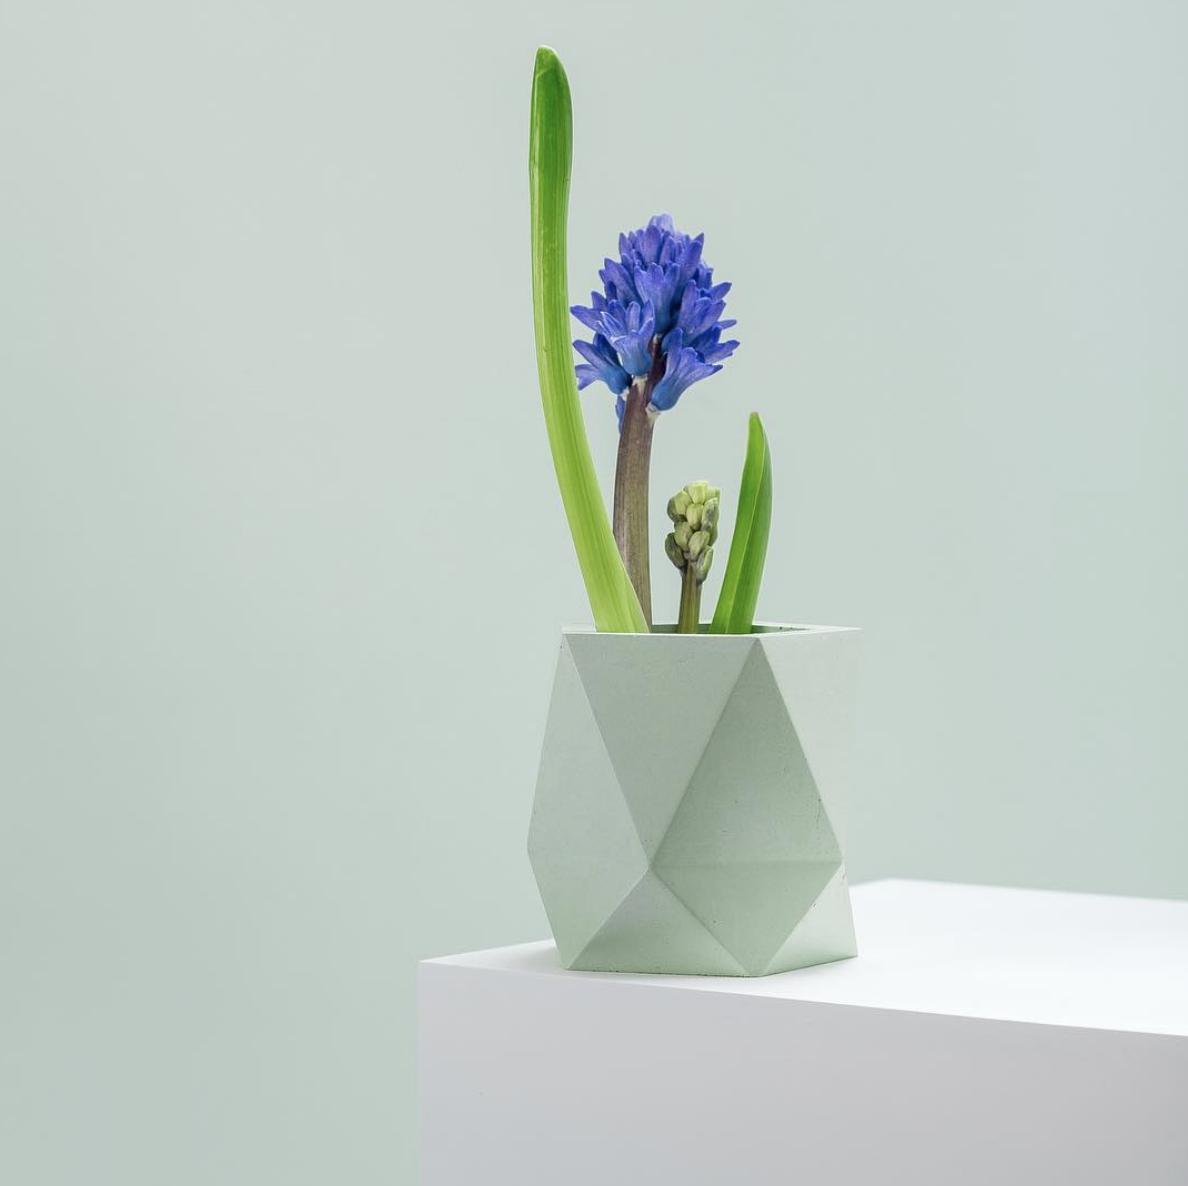 Polyhedron planter, mint color by  Frauklarer